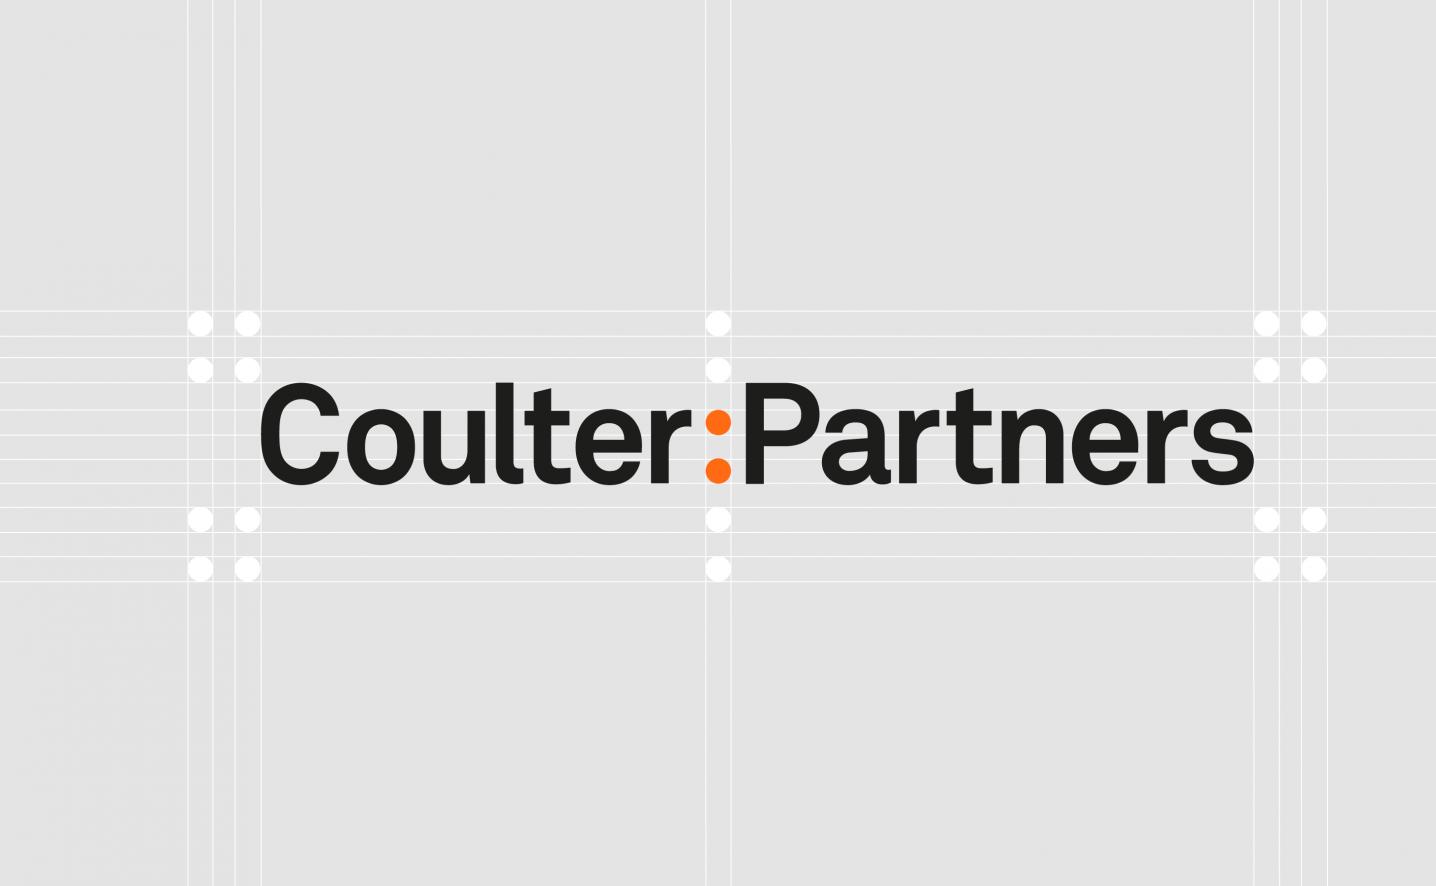 coulter-partners-logo-design